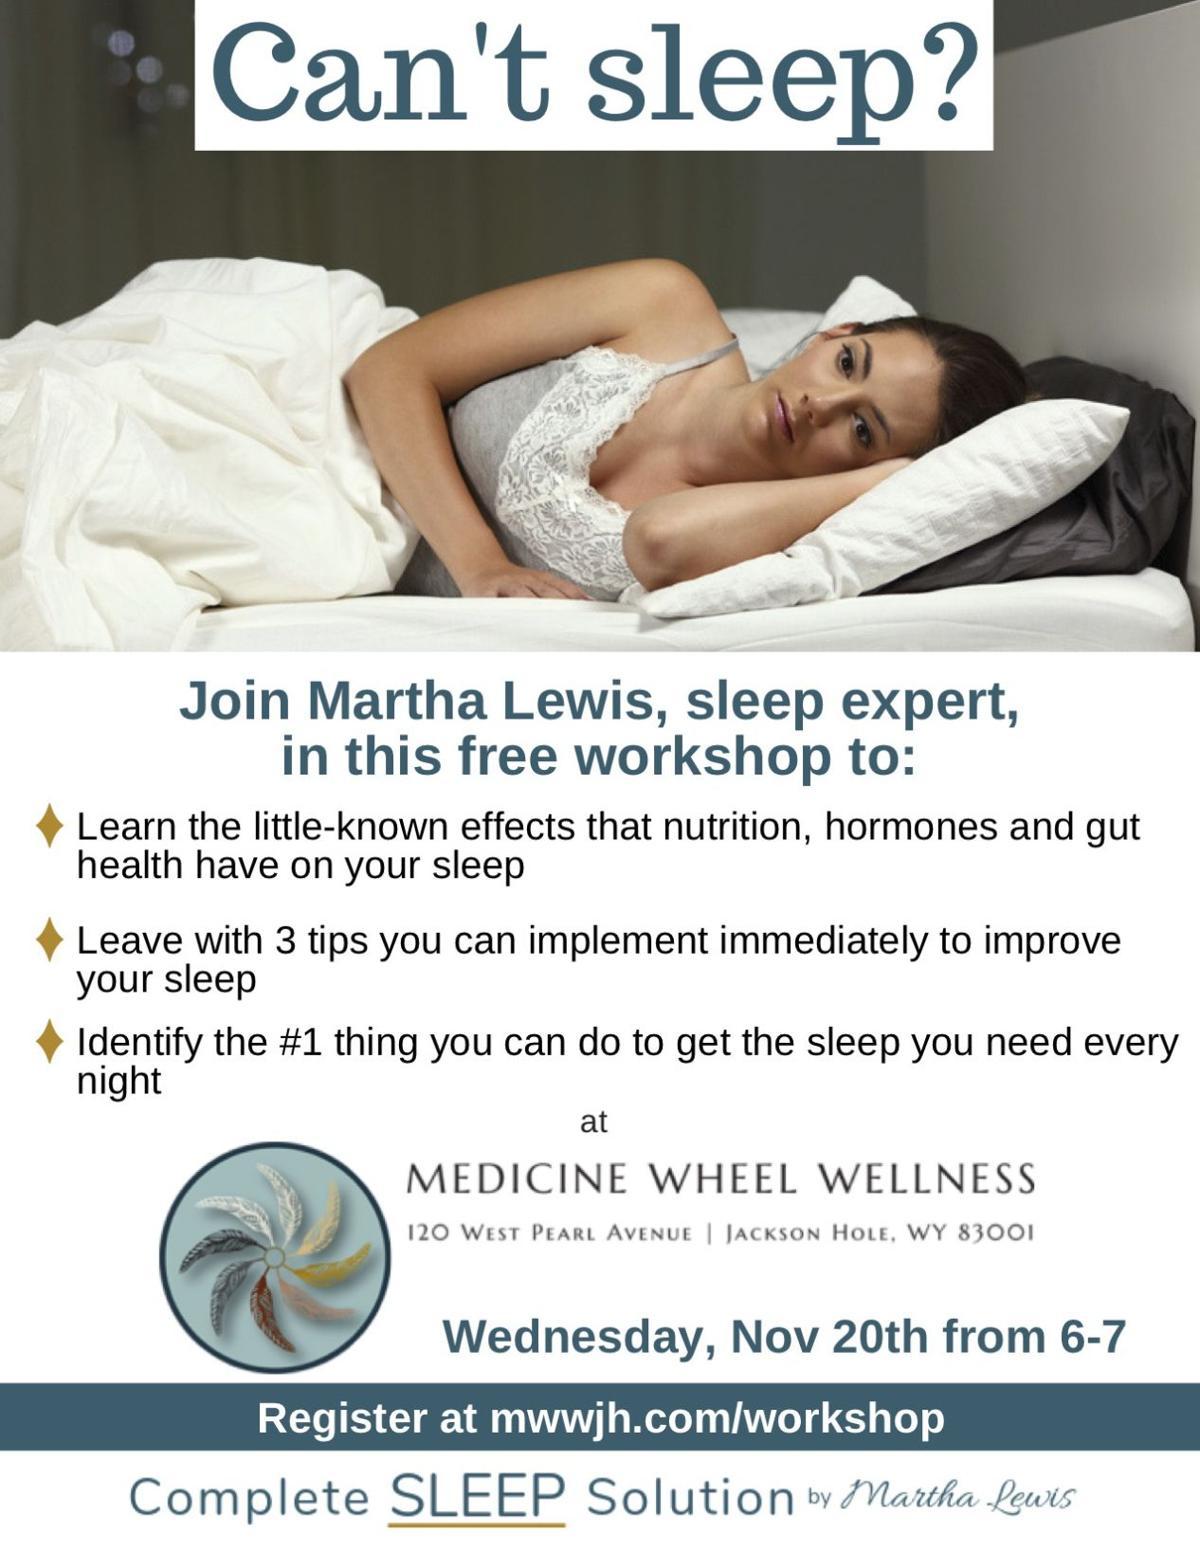 Complete Sleep Solution Workshop